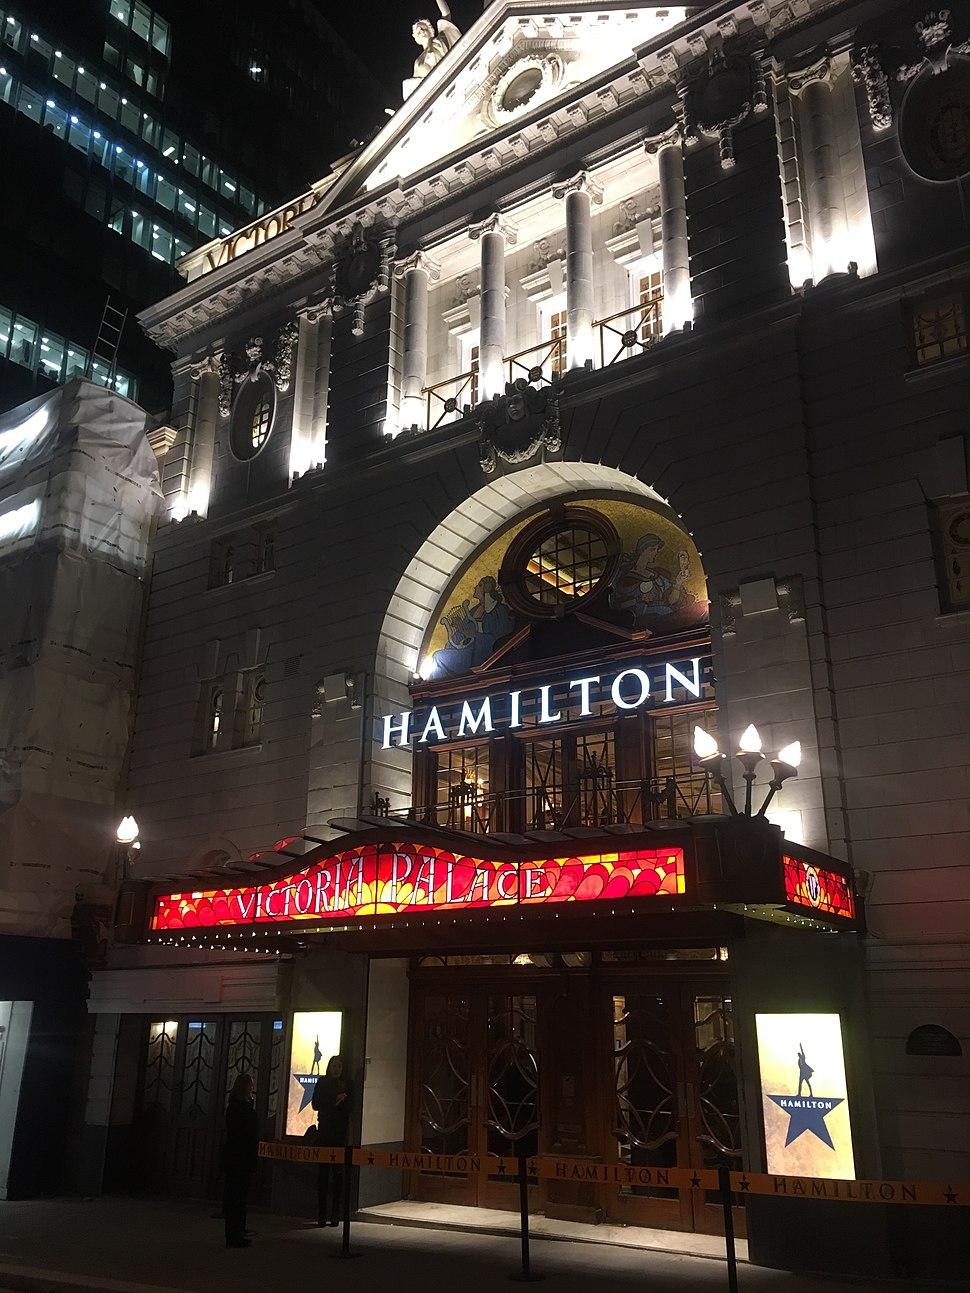 Hamilton at the Victoria Palace, December 2017